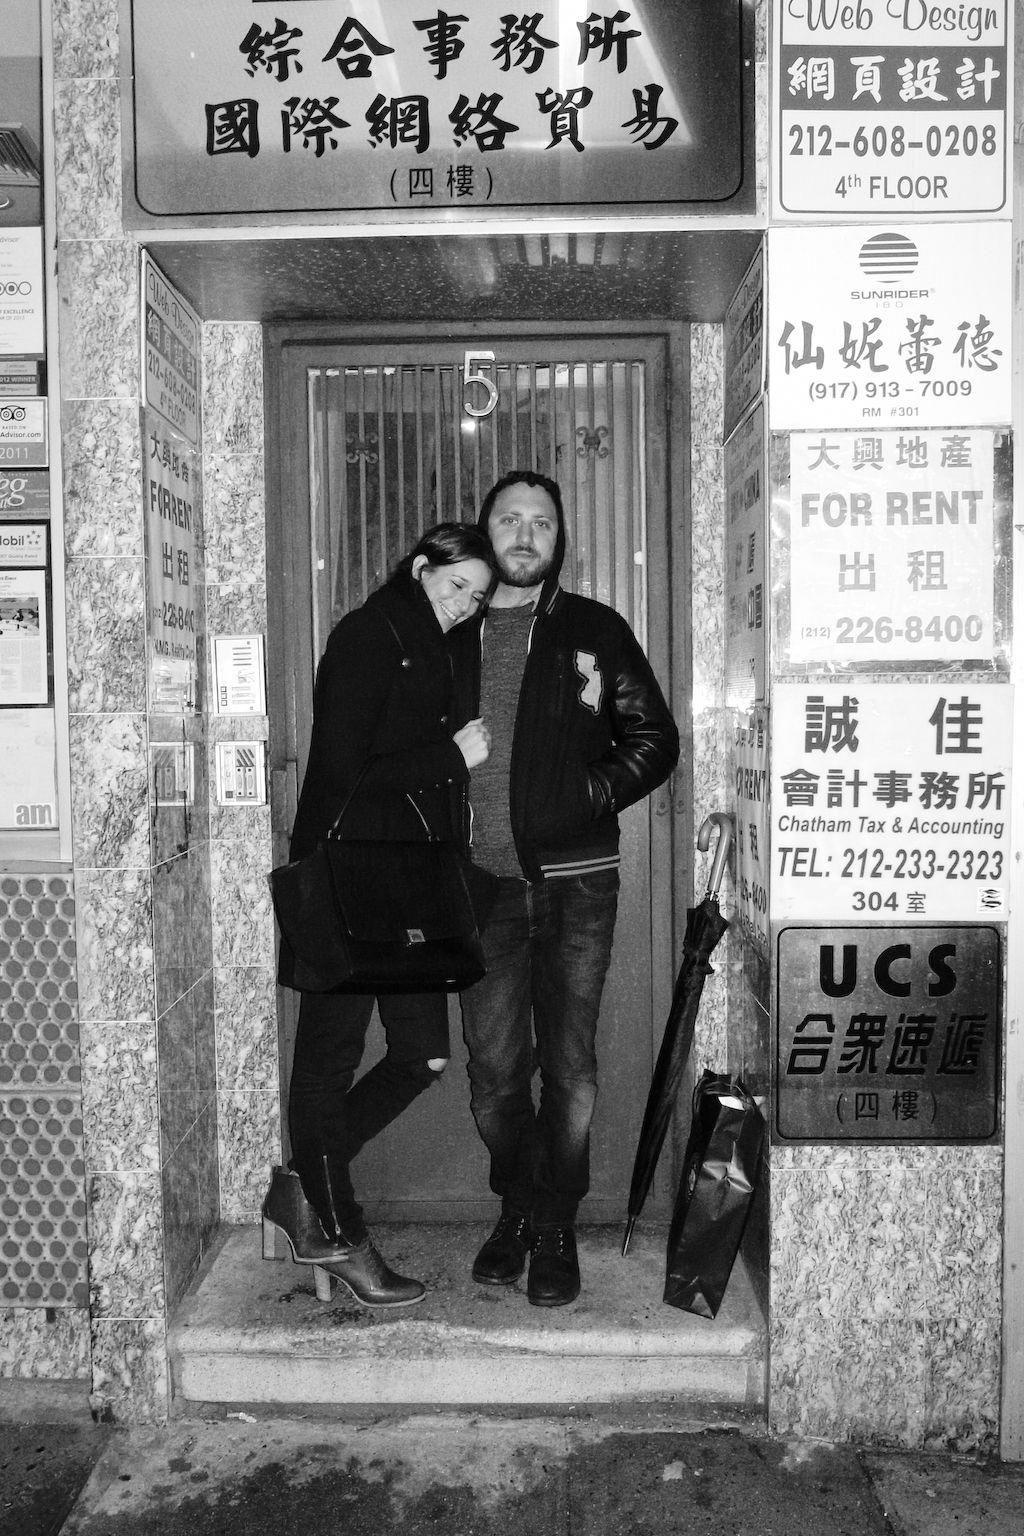 Chinatown doorway terry richardson blackandwhitecouplespics terry richardson white image couple photography